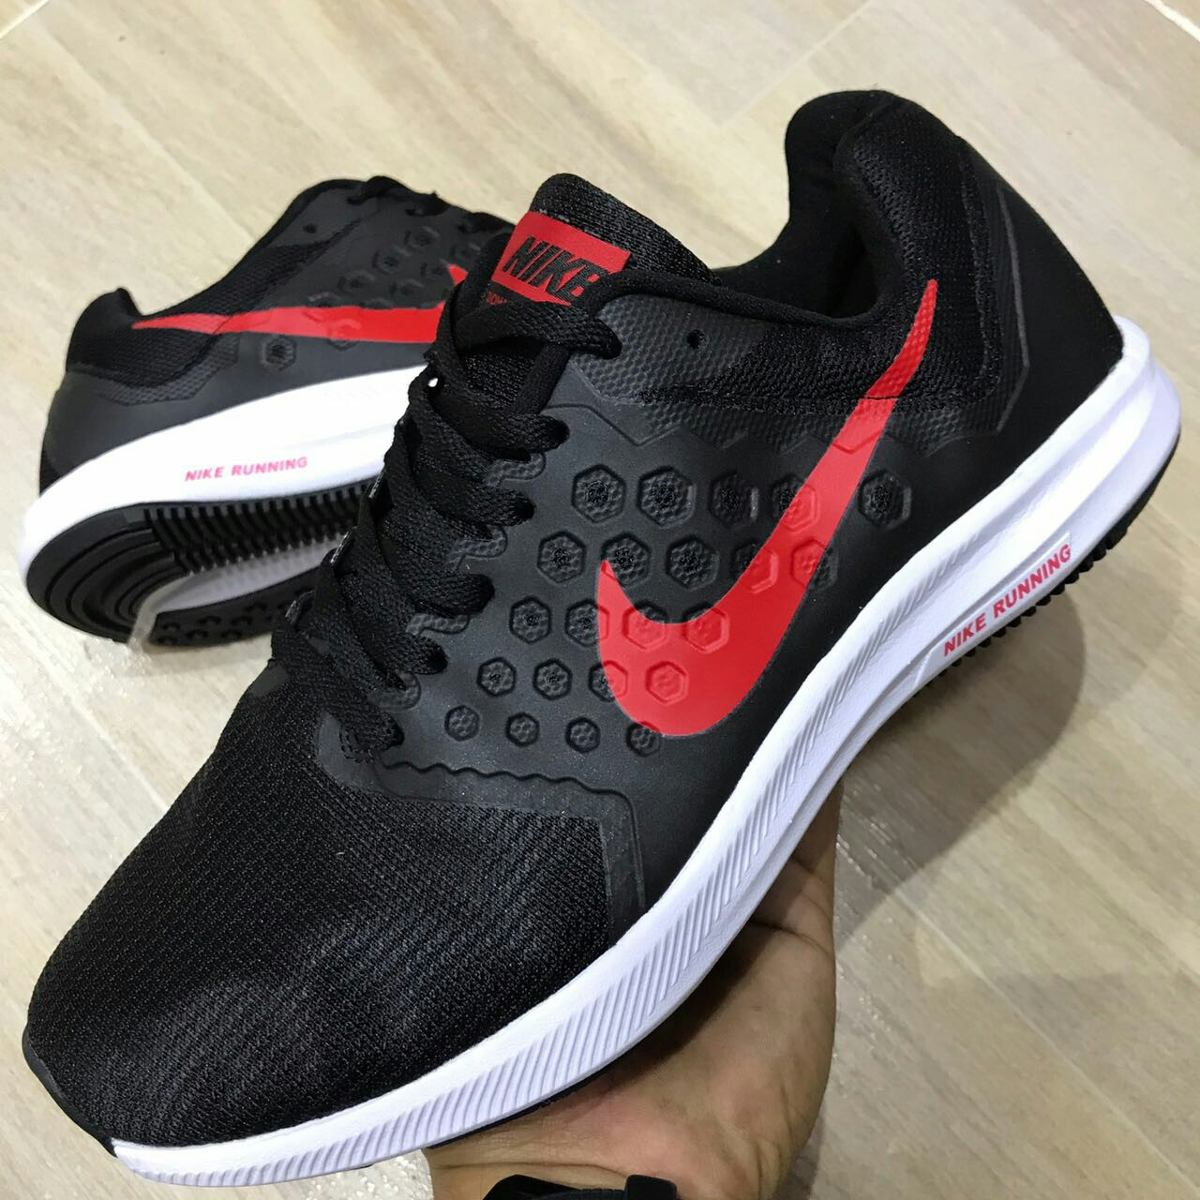 2zapatos nike running hombre